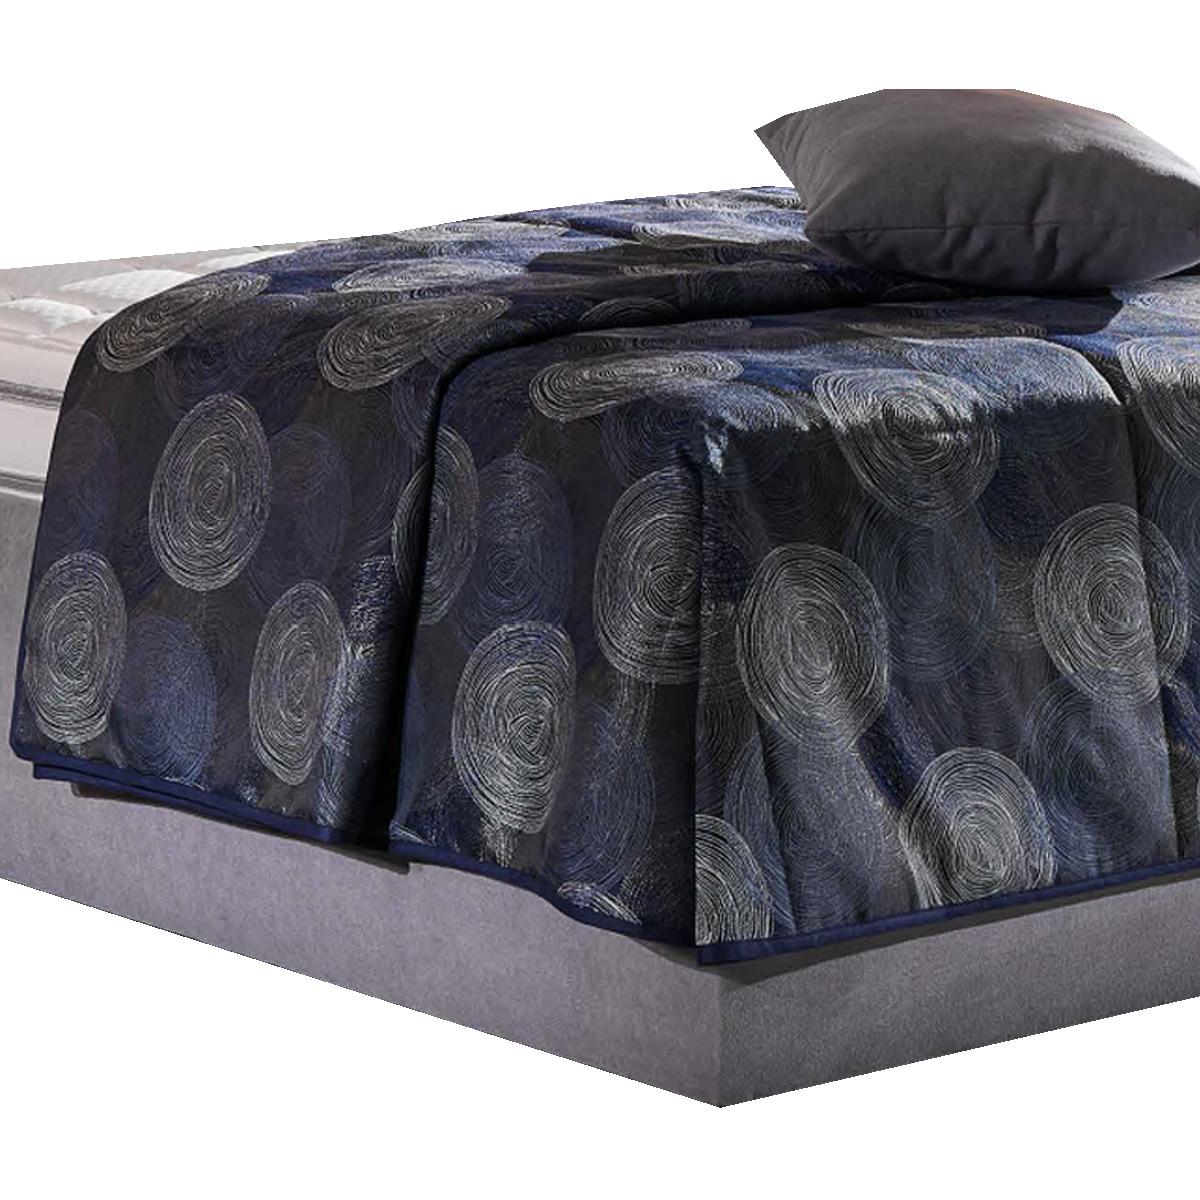 Full Size of Bett Liegehöhe 60 Cm Oschmann Comfortmaster Zubehr Tagesdecke Plaid Verschiedene Whlbar Stapelbar 120 Breit Boxspring Selber Bauen Schlafzimmer Betten Bett Bett Liegehöhe 60 Cm